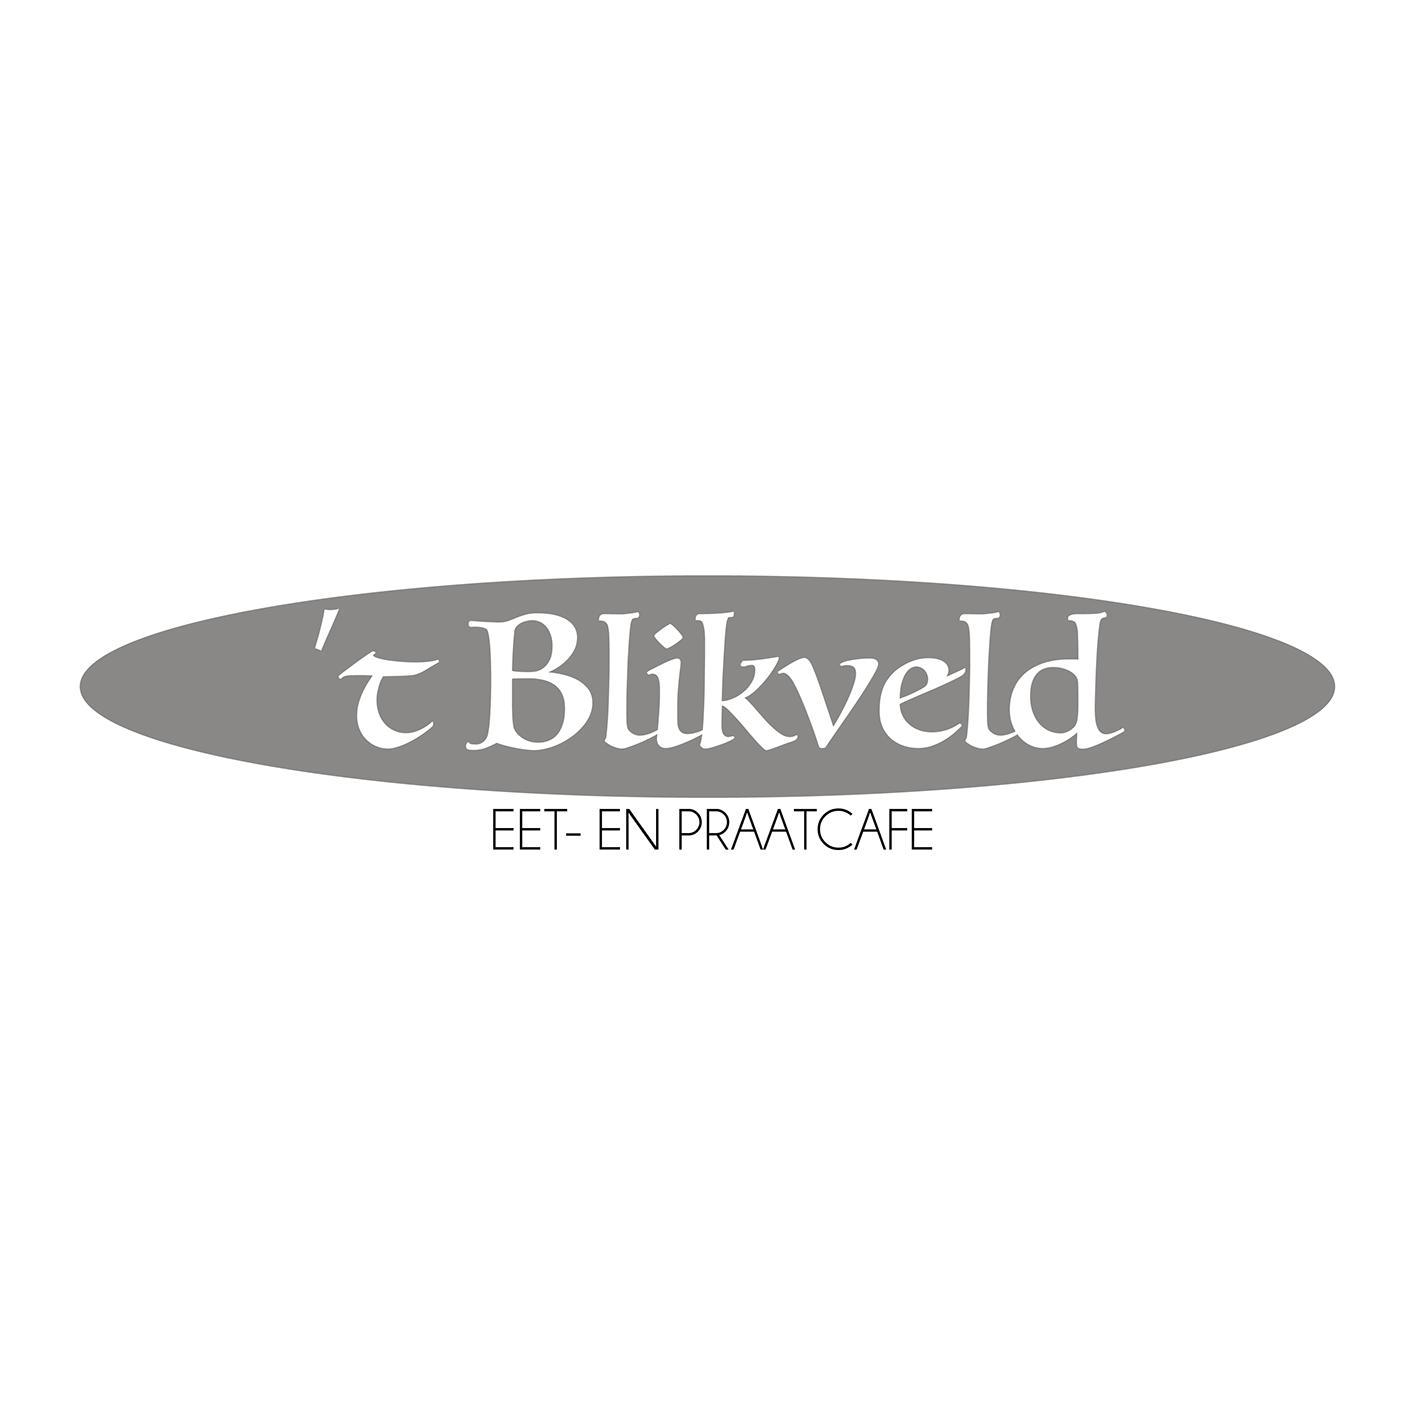 Eetcafe Blikveld